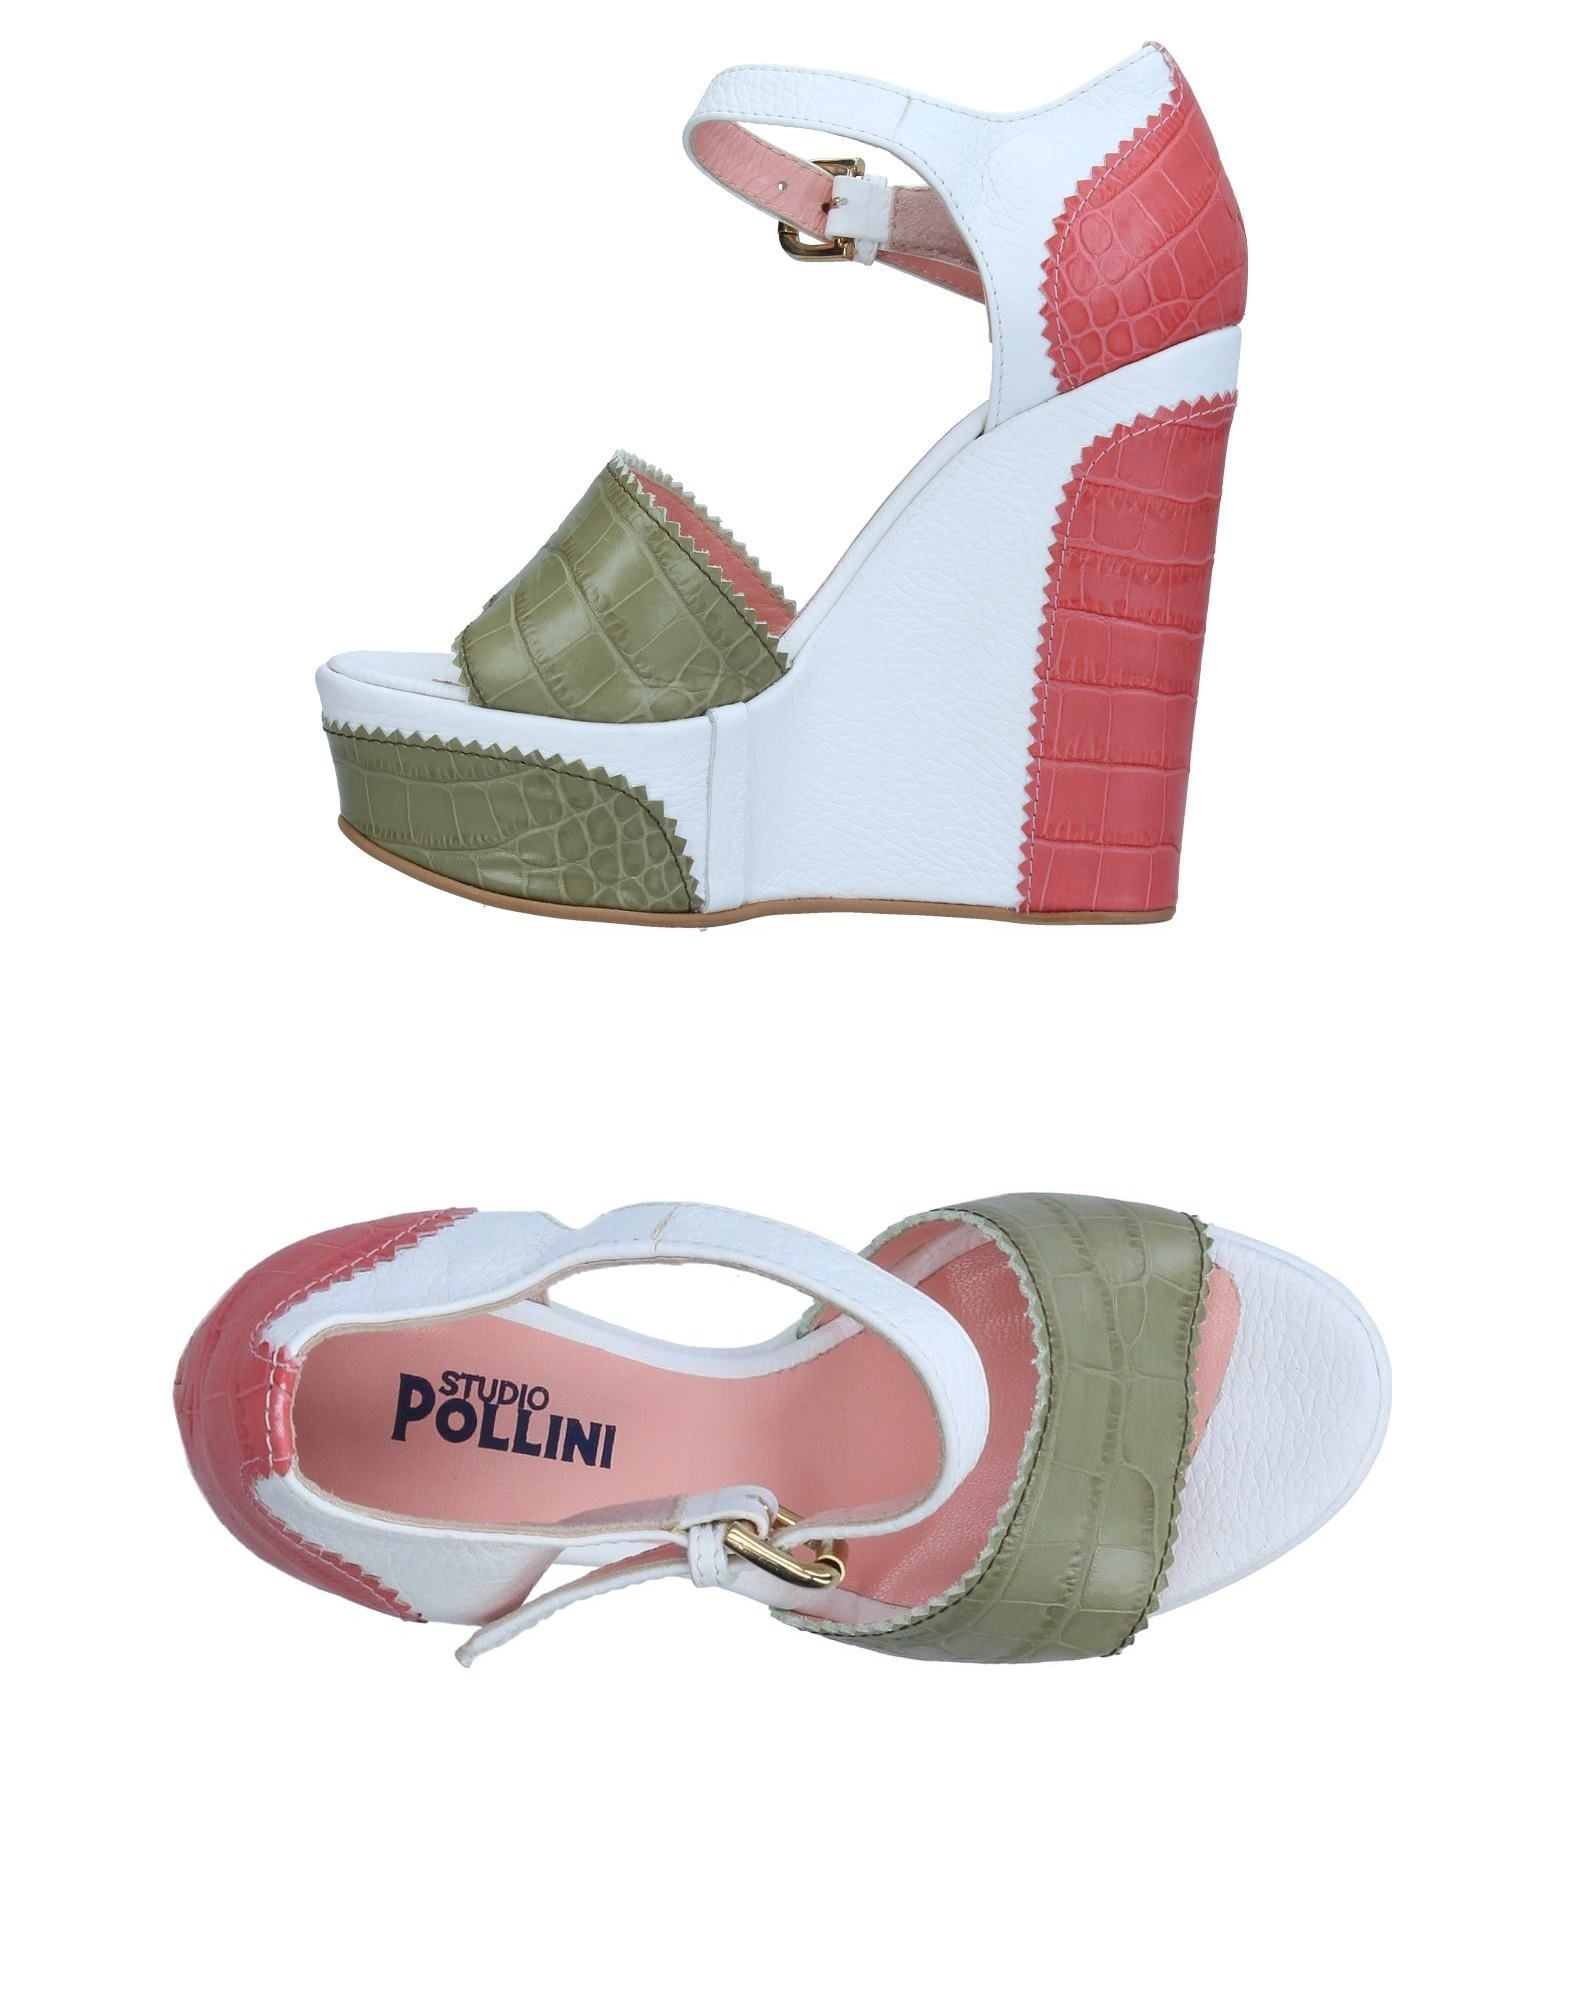 Sandales Studio Pollini Femme - Sandales Studio Pollini sur